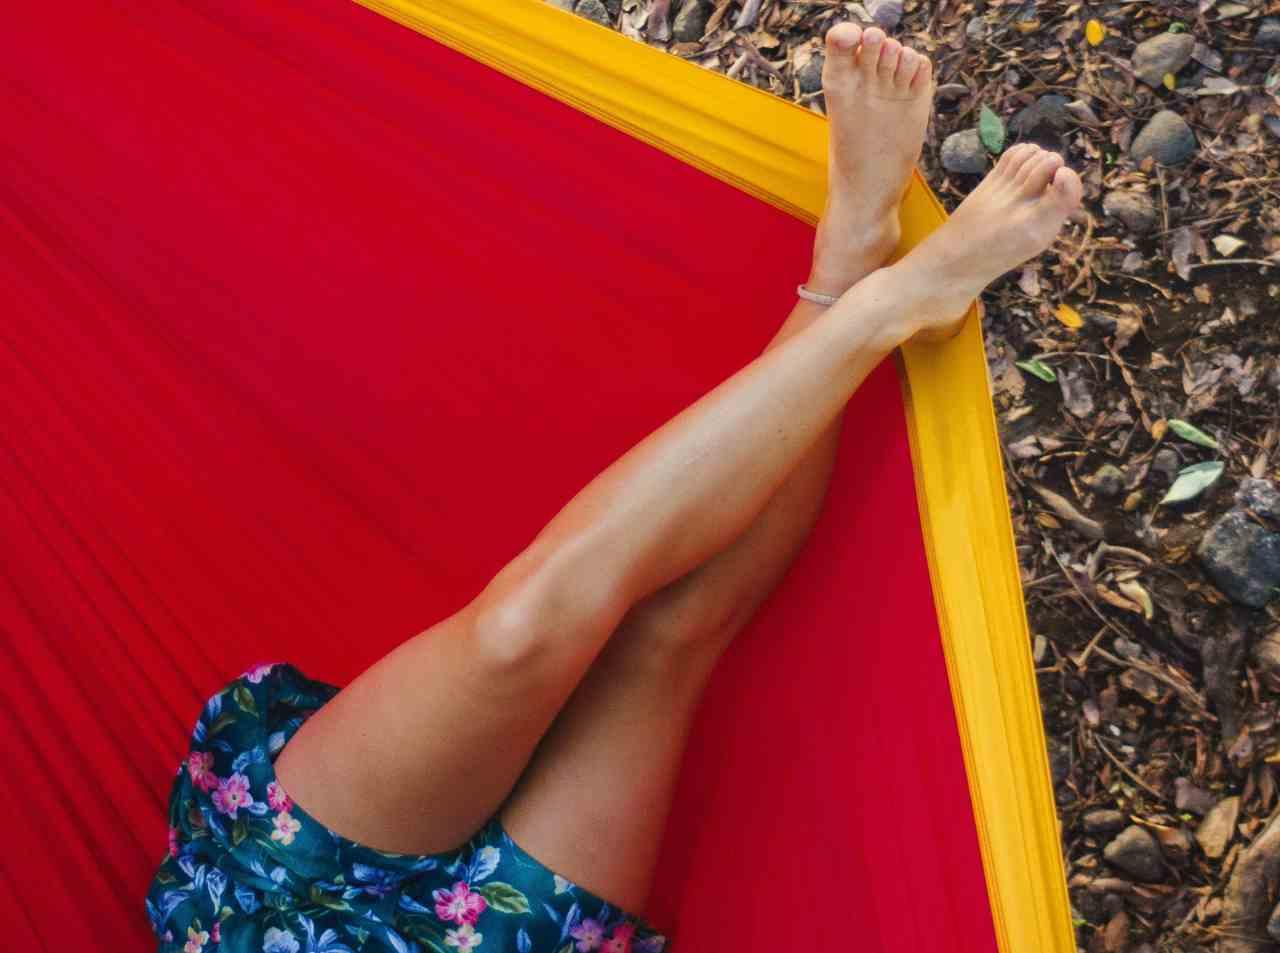 Gambe e piedi gonfi (fonte unsplash)